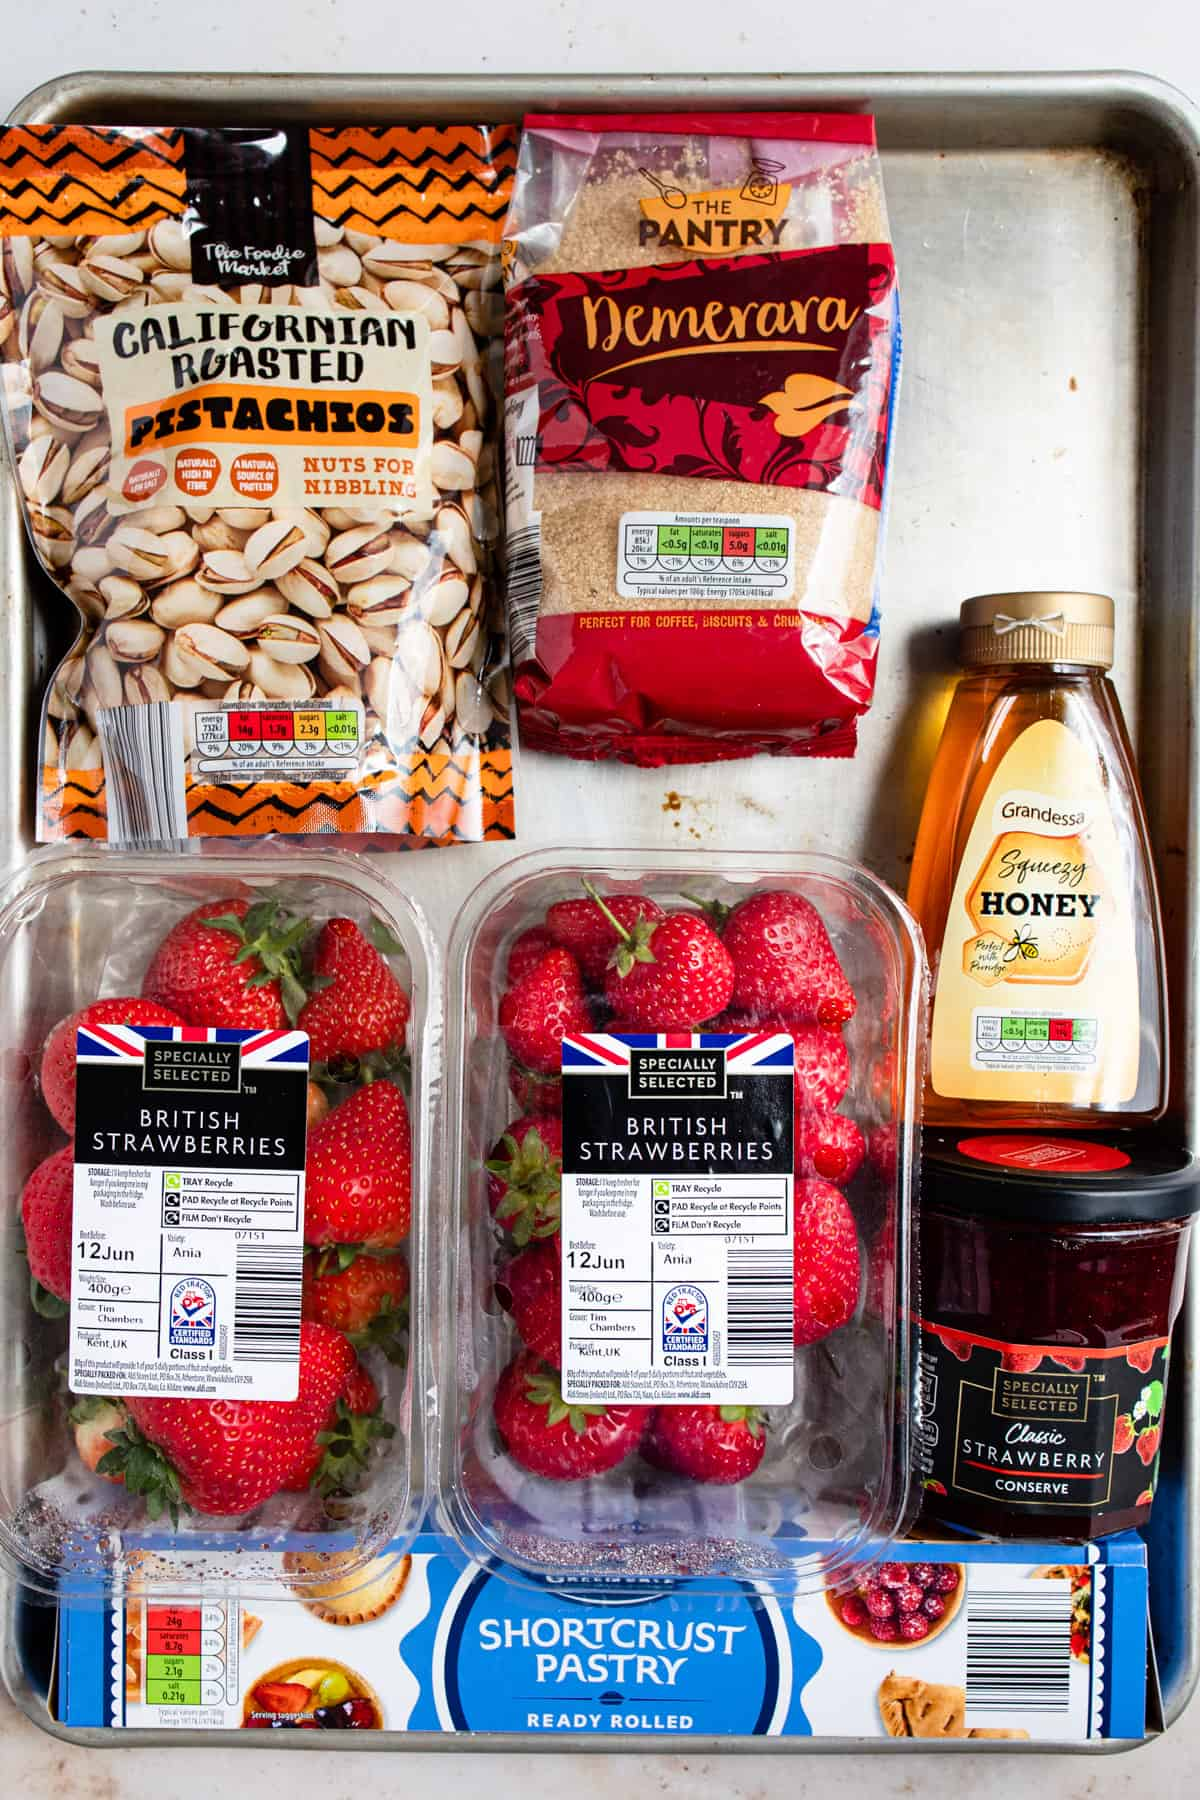 Aldi ingredients for fresh strawberry tart on a baking tray.